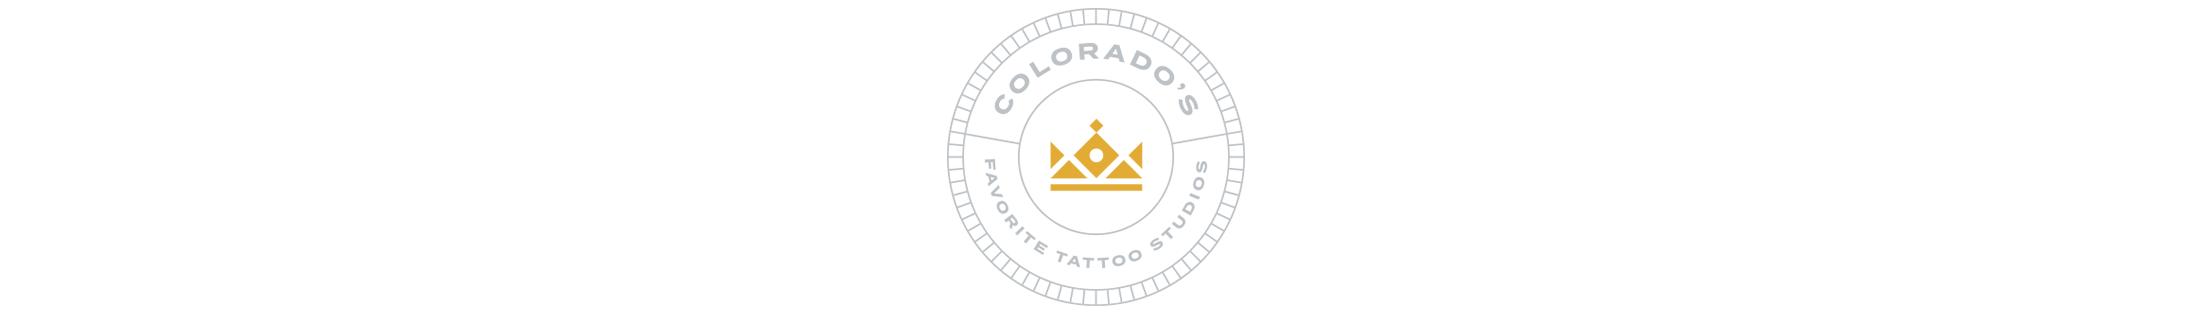 Colorado's Favorite - Banner.png